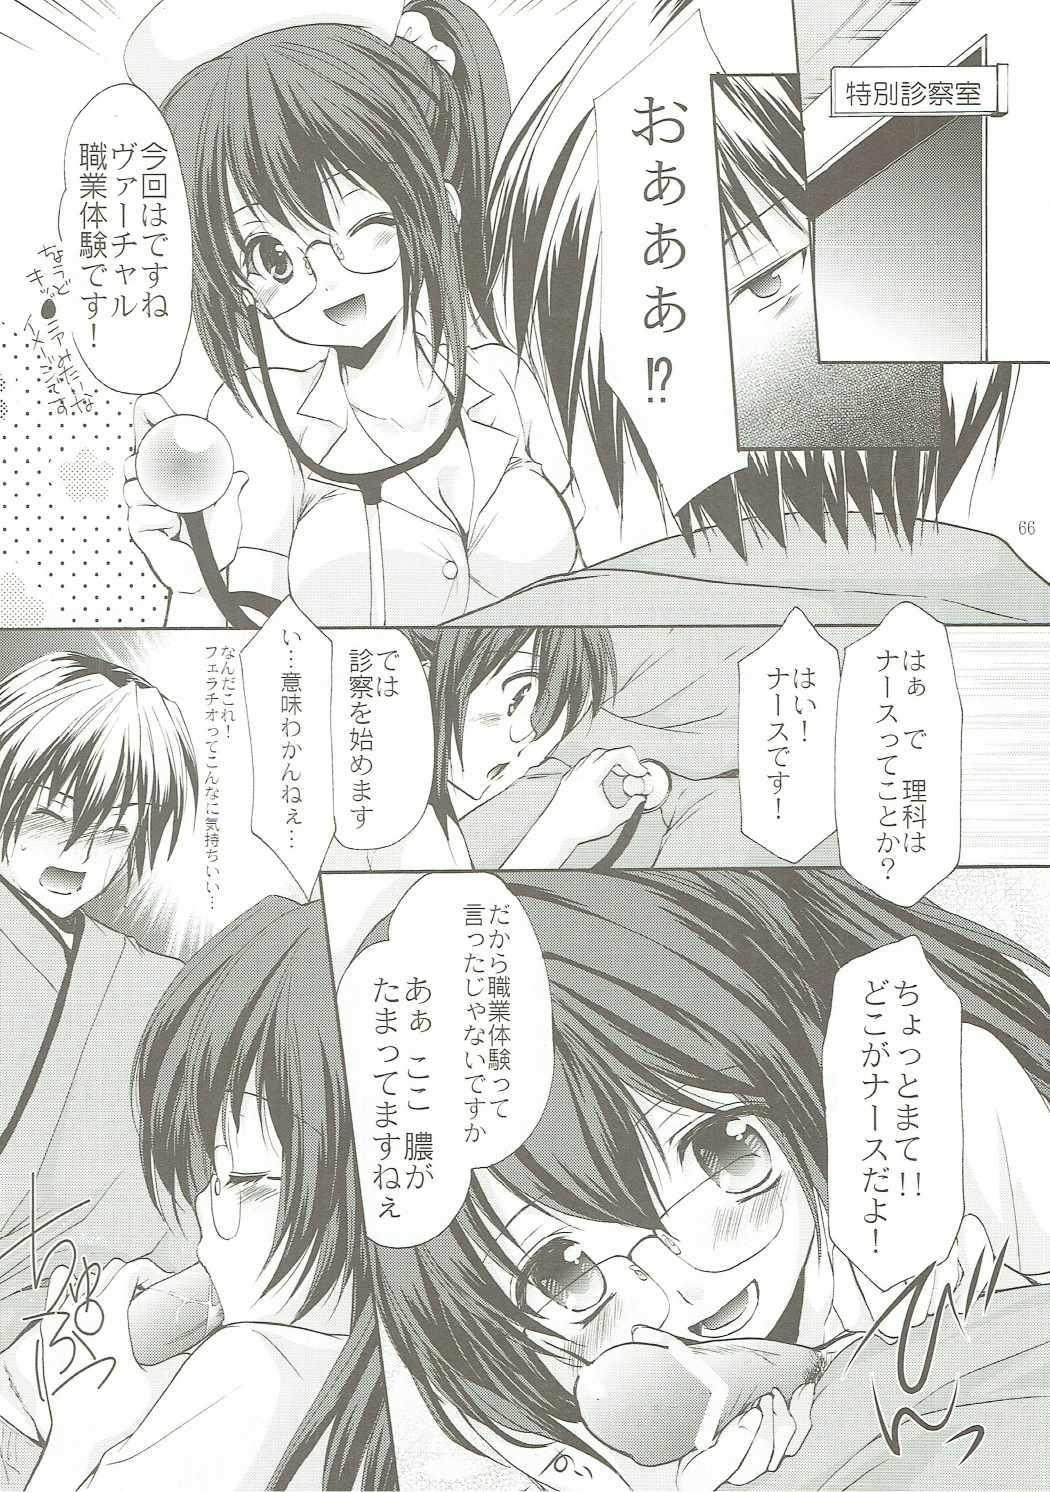 ANIME COLLECTION Imomuya Honpo - Singleton Anime Soushuuhen 64